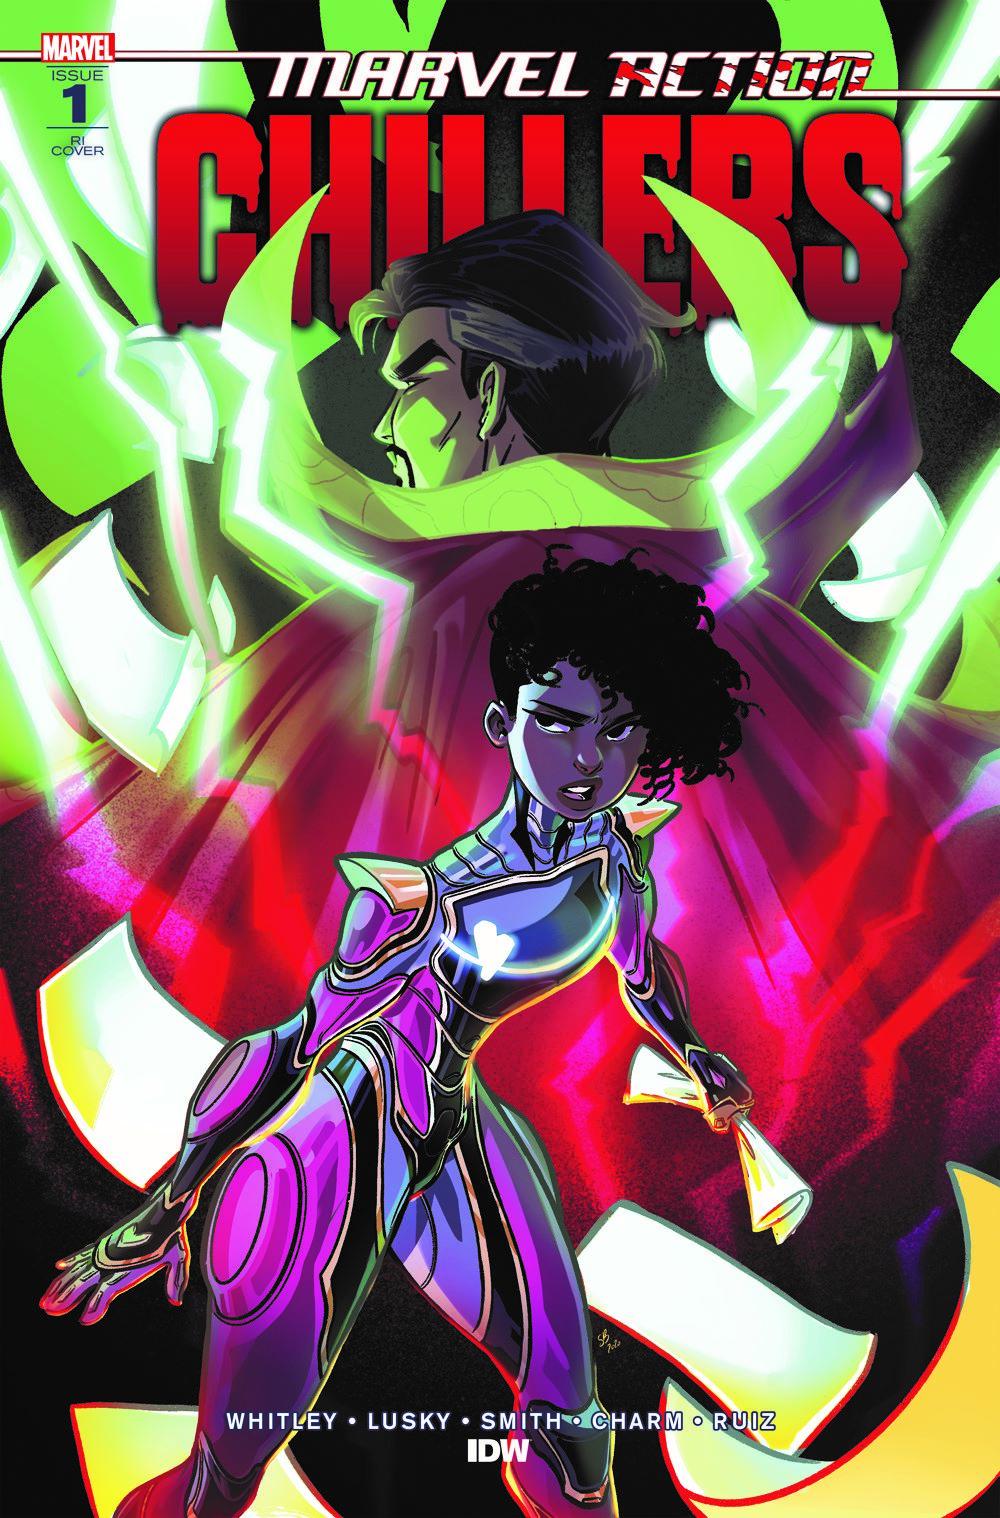 AvengersCHILLERS_01_CvrRI ComicList Previews: MARVEL ACTION CHILLERS #1